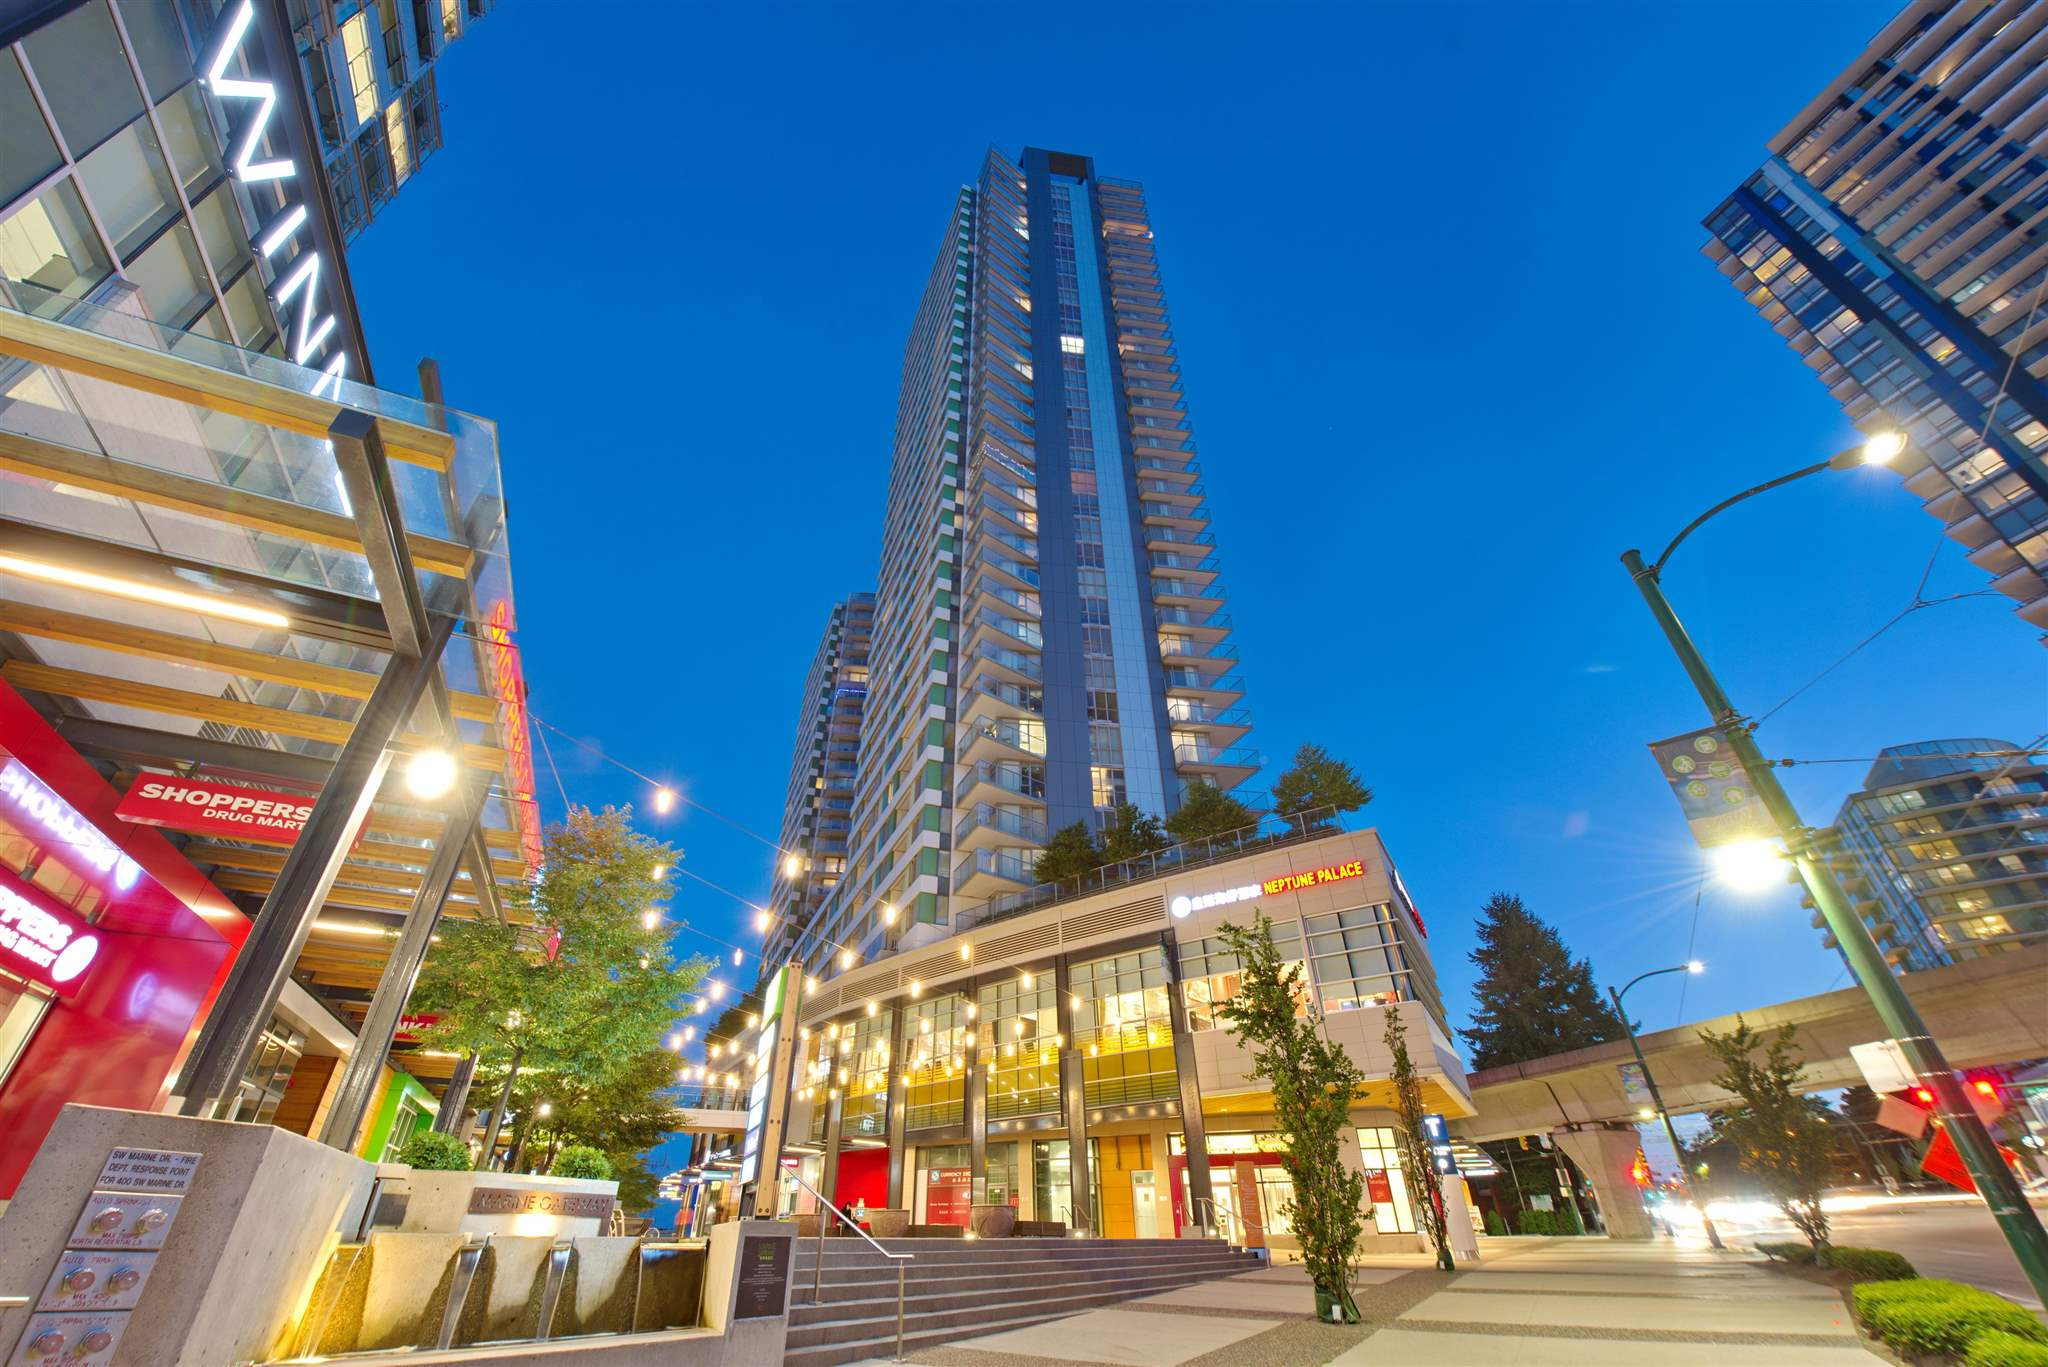 1606 488 SW MARINE DRIVE - Marpole Apartment/Condo for sale, 2 Bedrooms (R2605749)